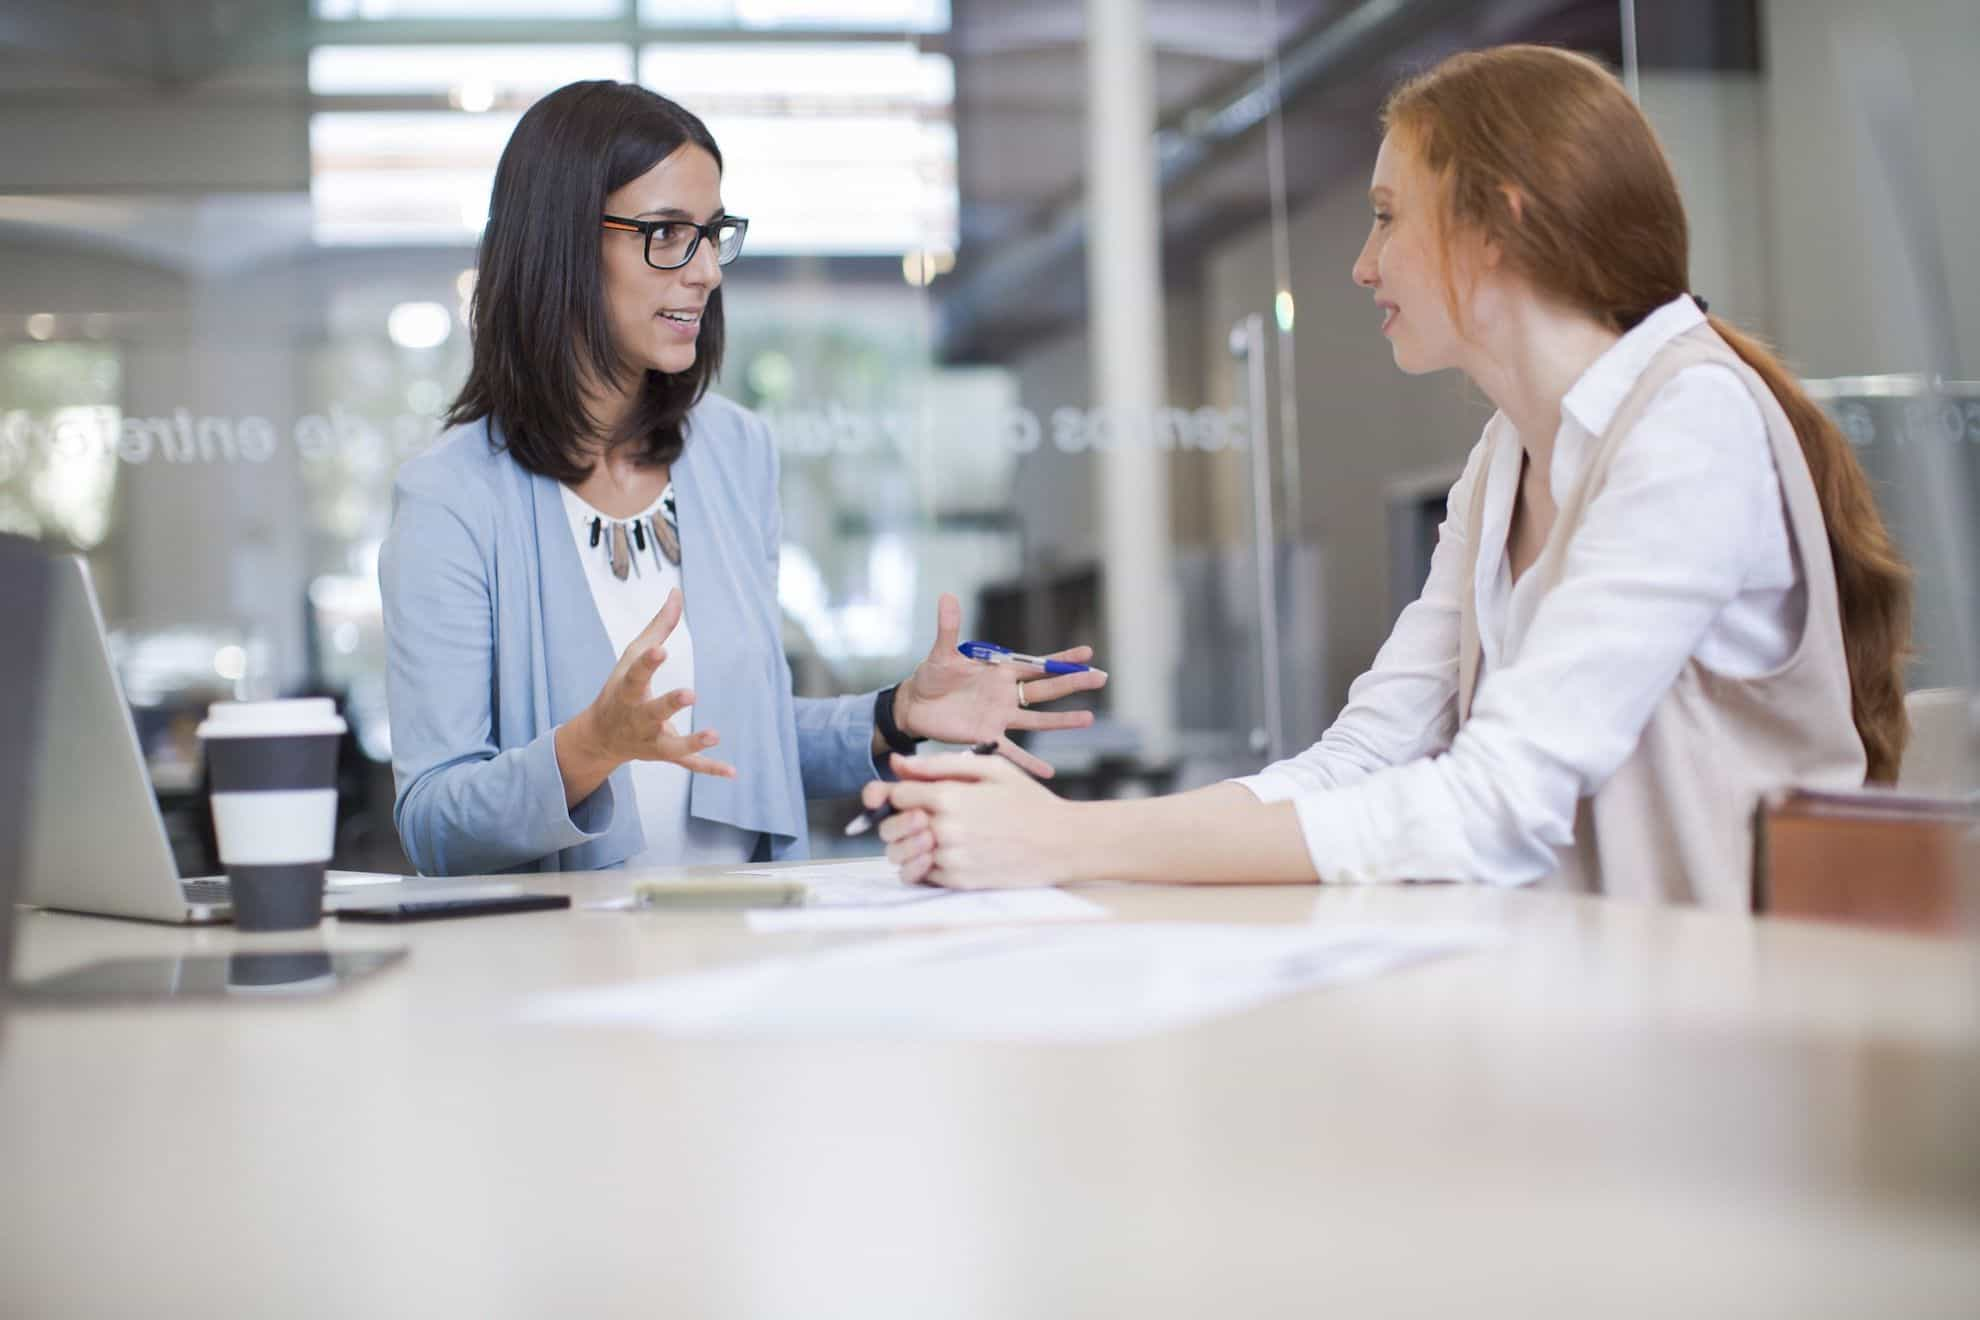 7 Exemplos e tipos de treinamentos nas empresas